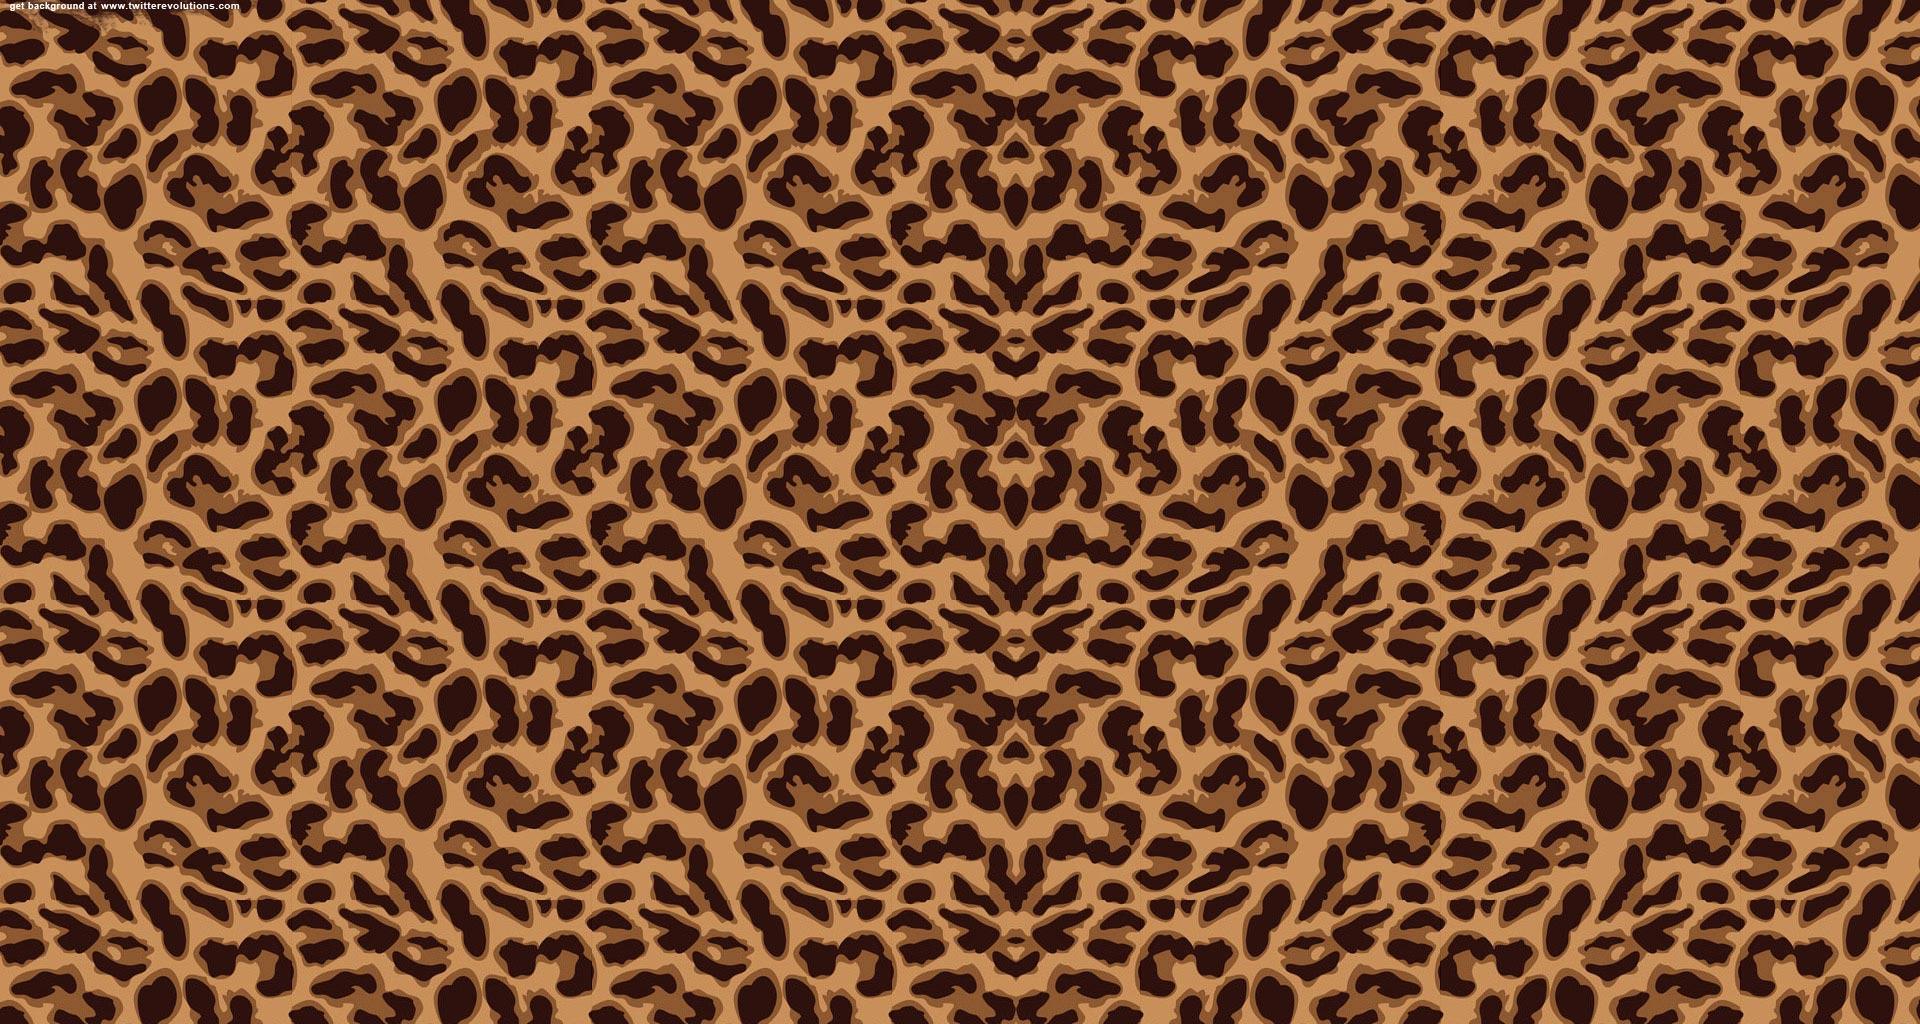 Leopard print Twitter background   Twitterevolutions 1920x1024